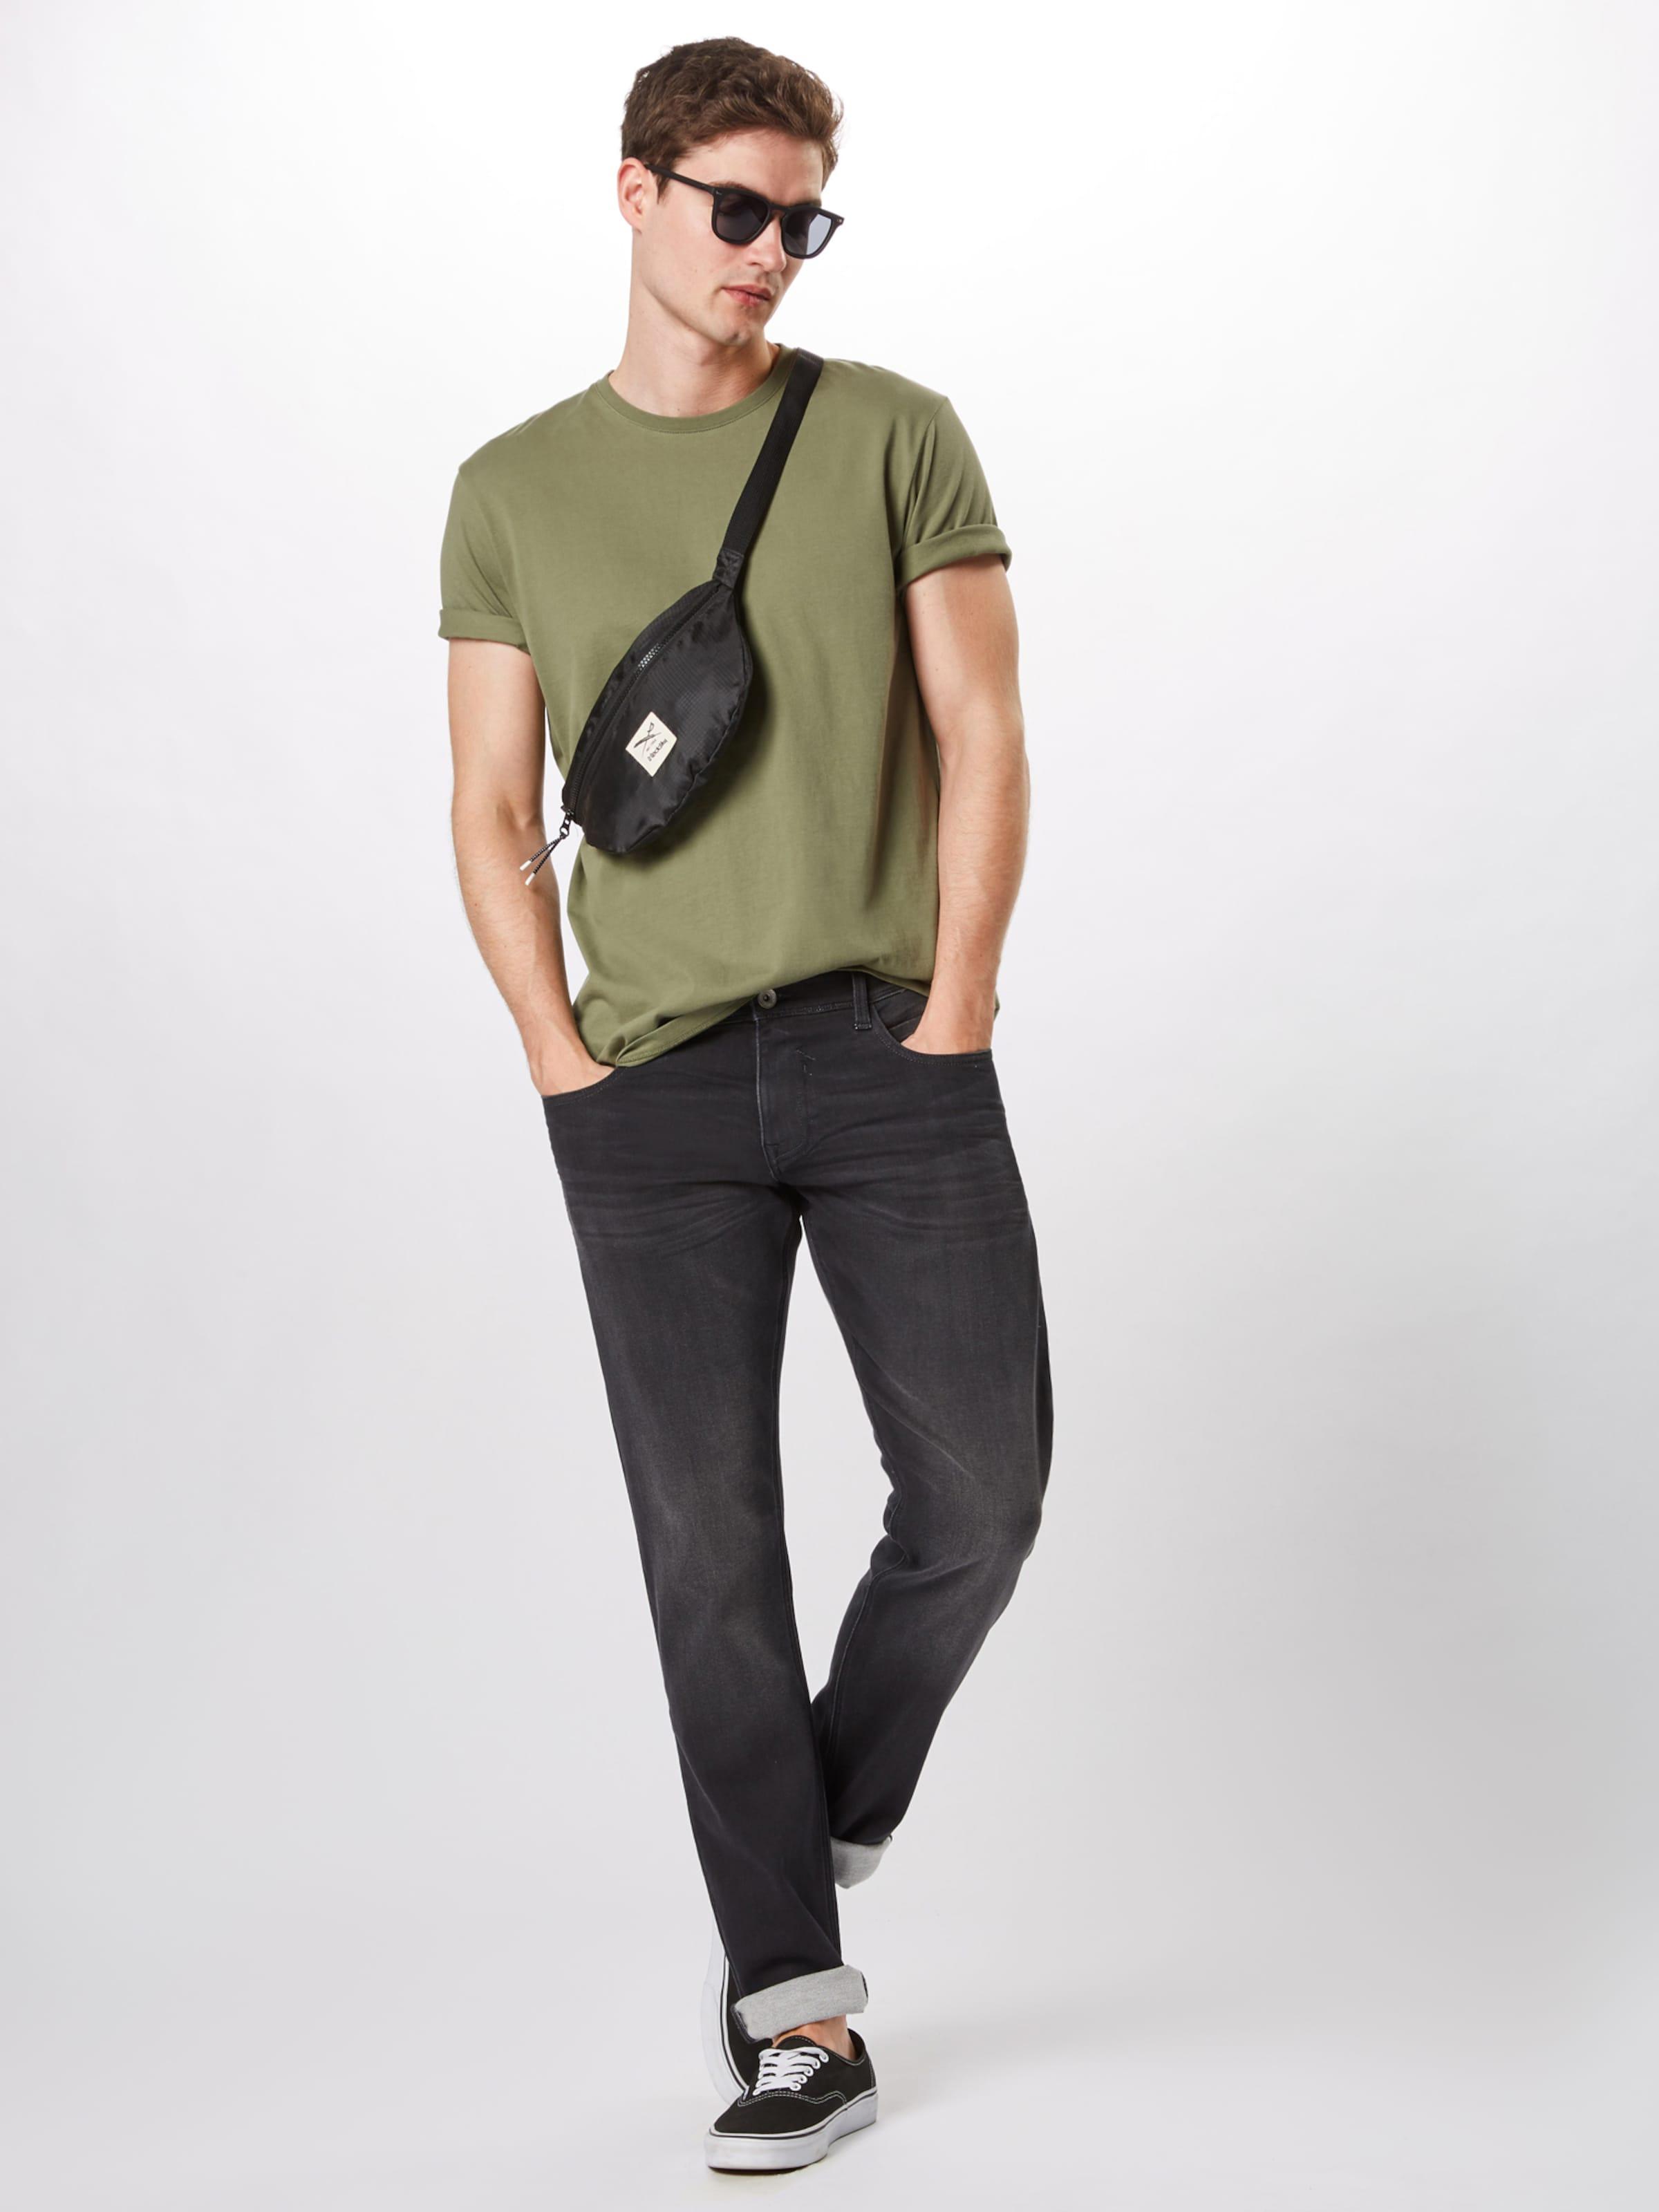 Esprit Esprit En Esprit shirt T Kaki shirt T shirt En T Kaki En nXN0w8OkP